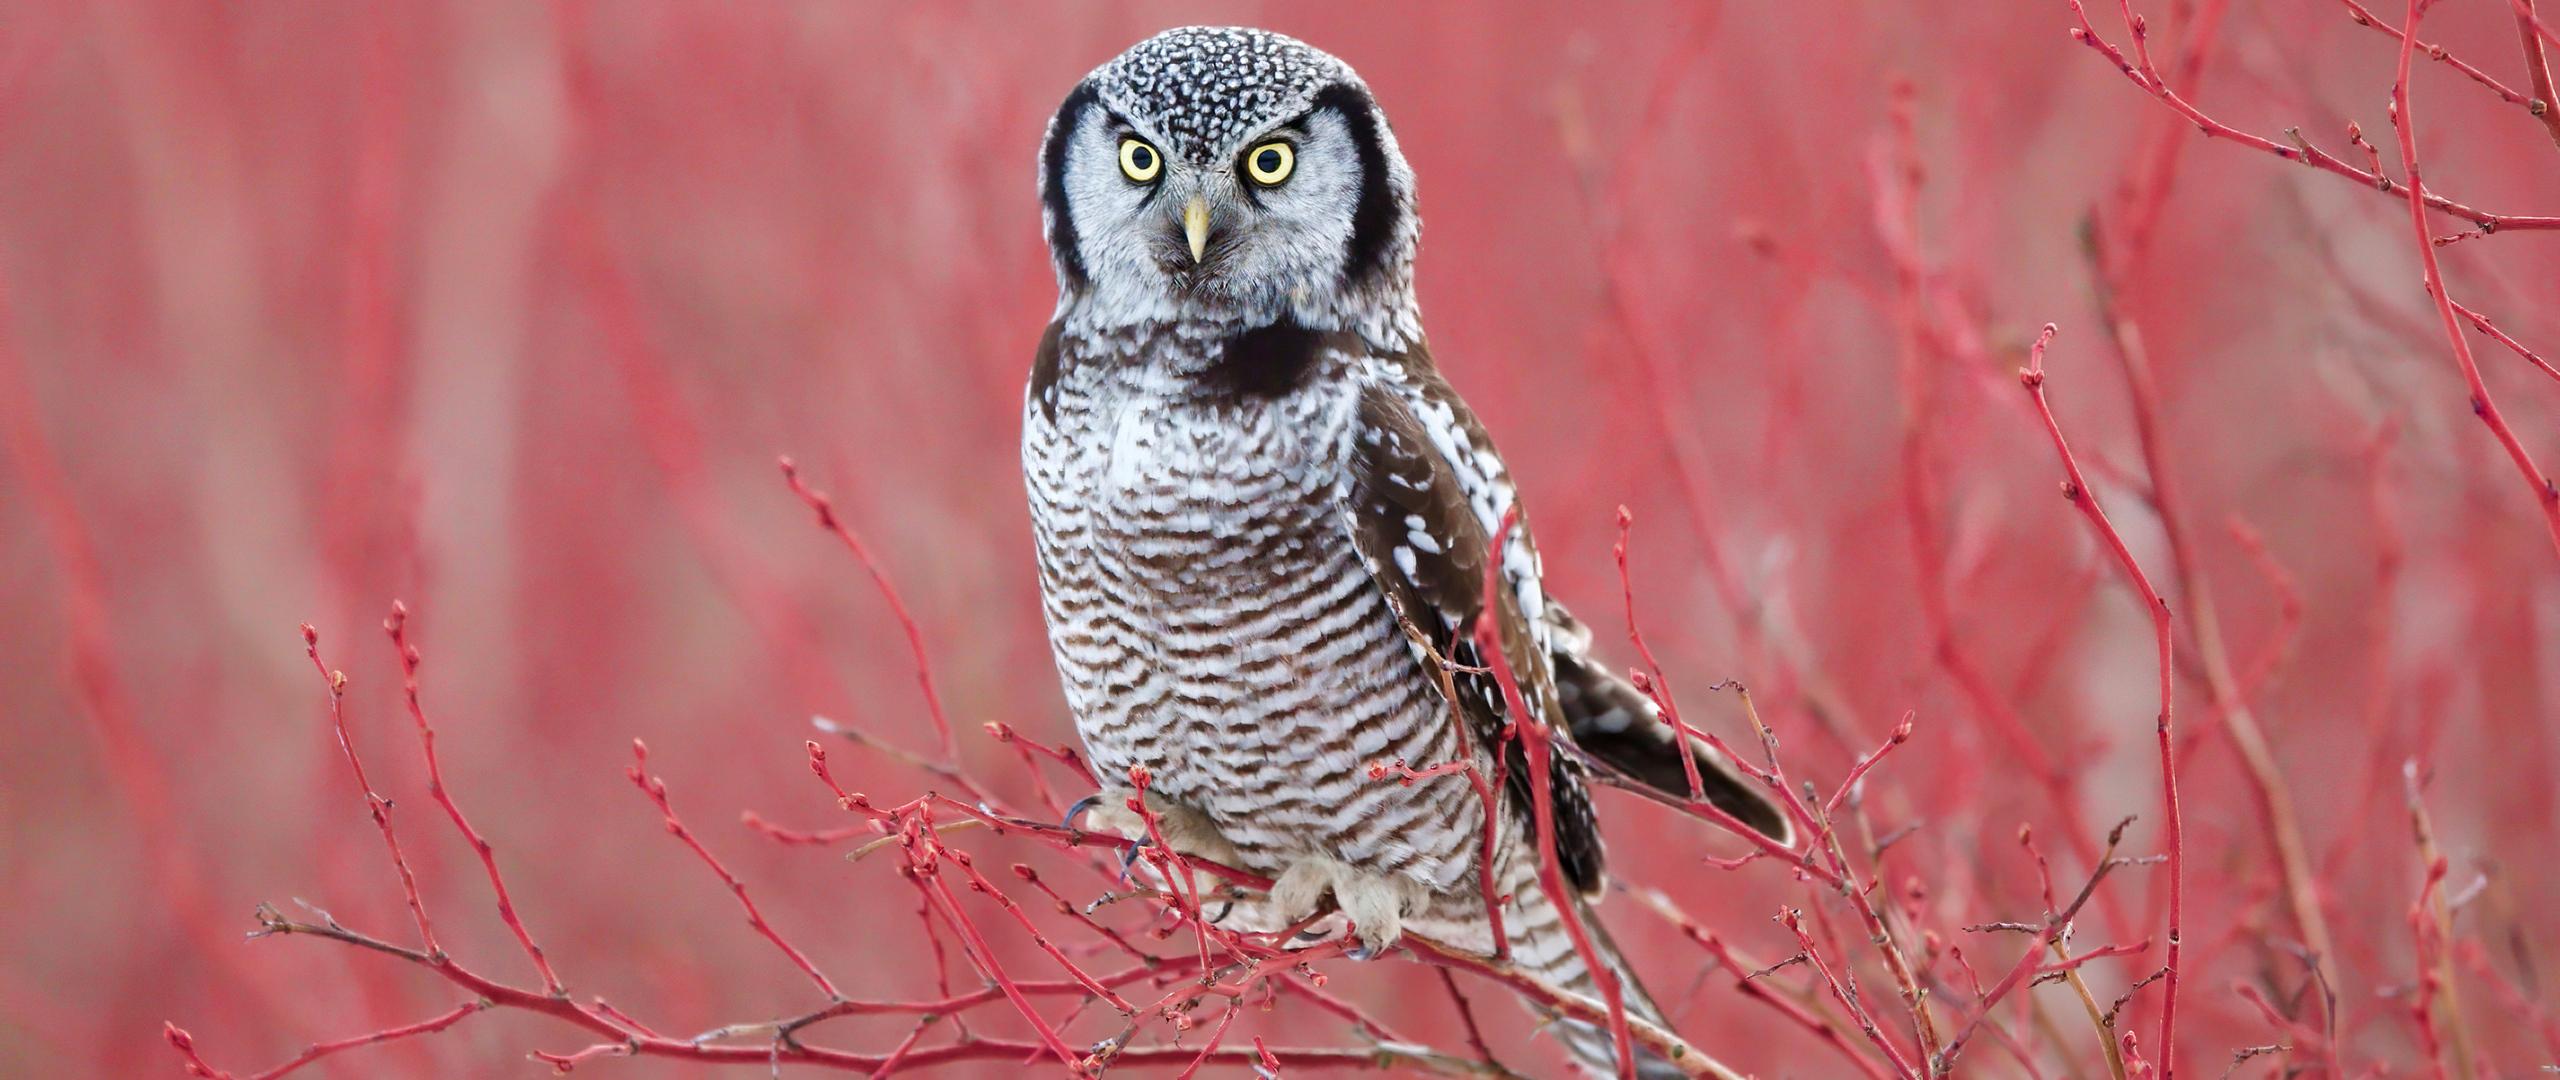 2560x1080 White Hawk Owl 4k 2560x1080 Resolution HD 4k ...